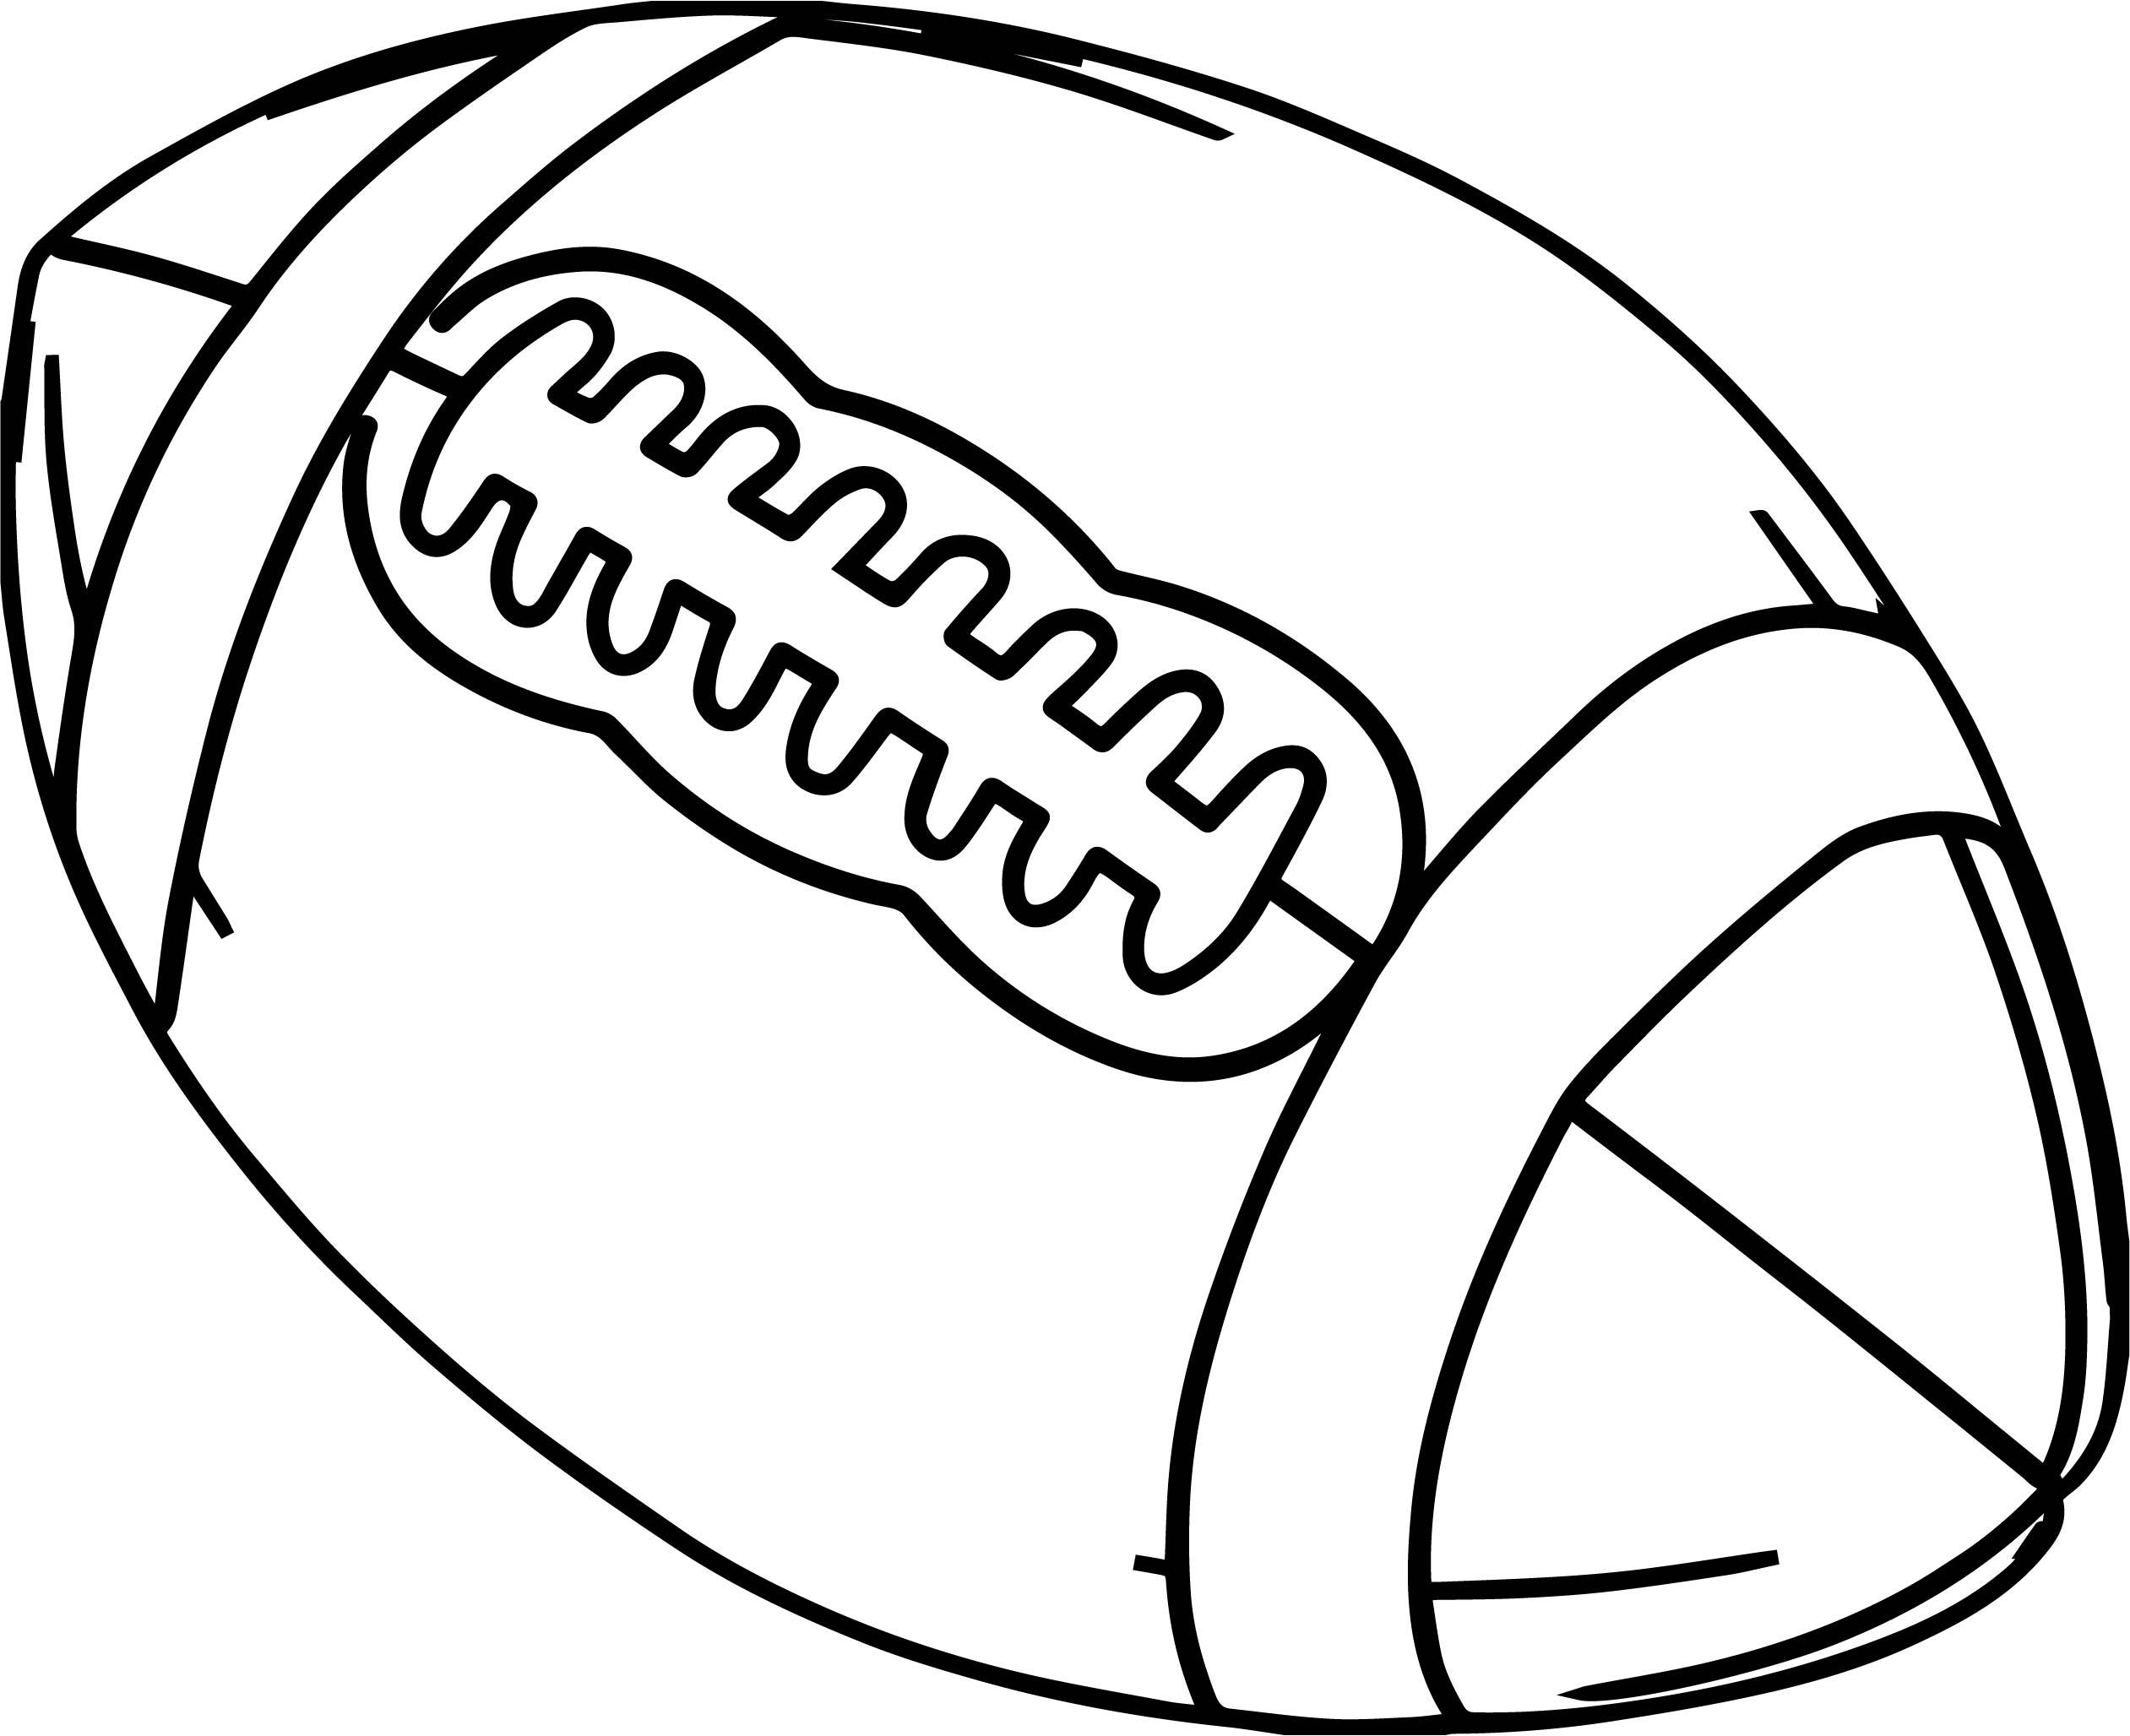 2522x2056 Chicago Bulls Logo Drawing Nba How To Draw Chicago Bulls Logo